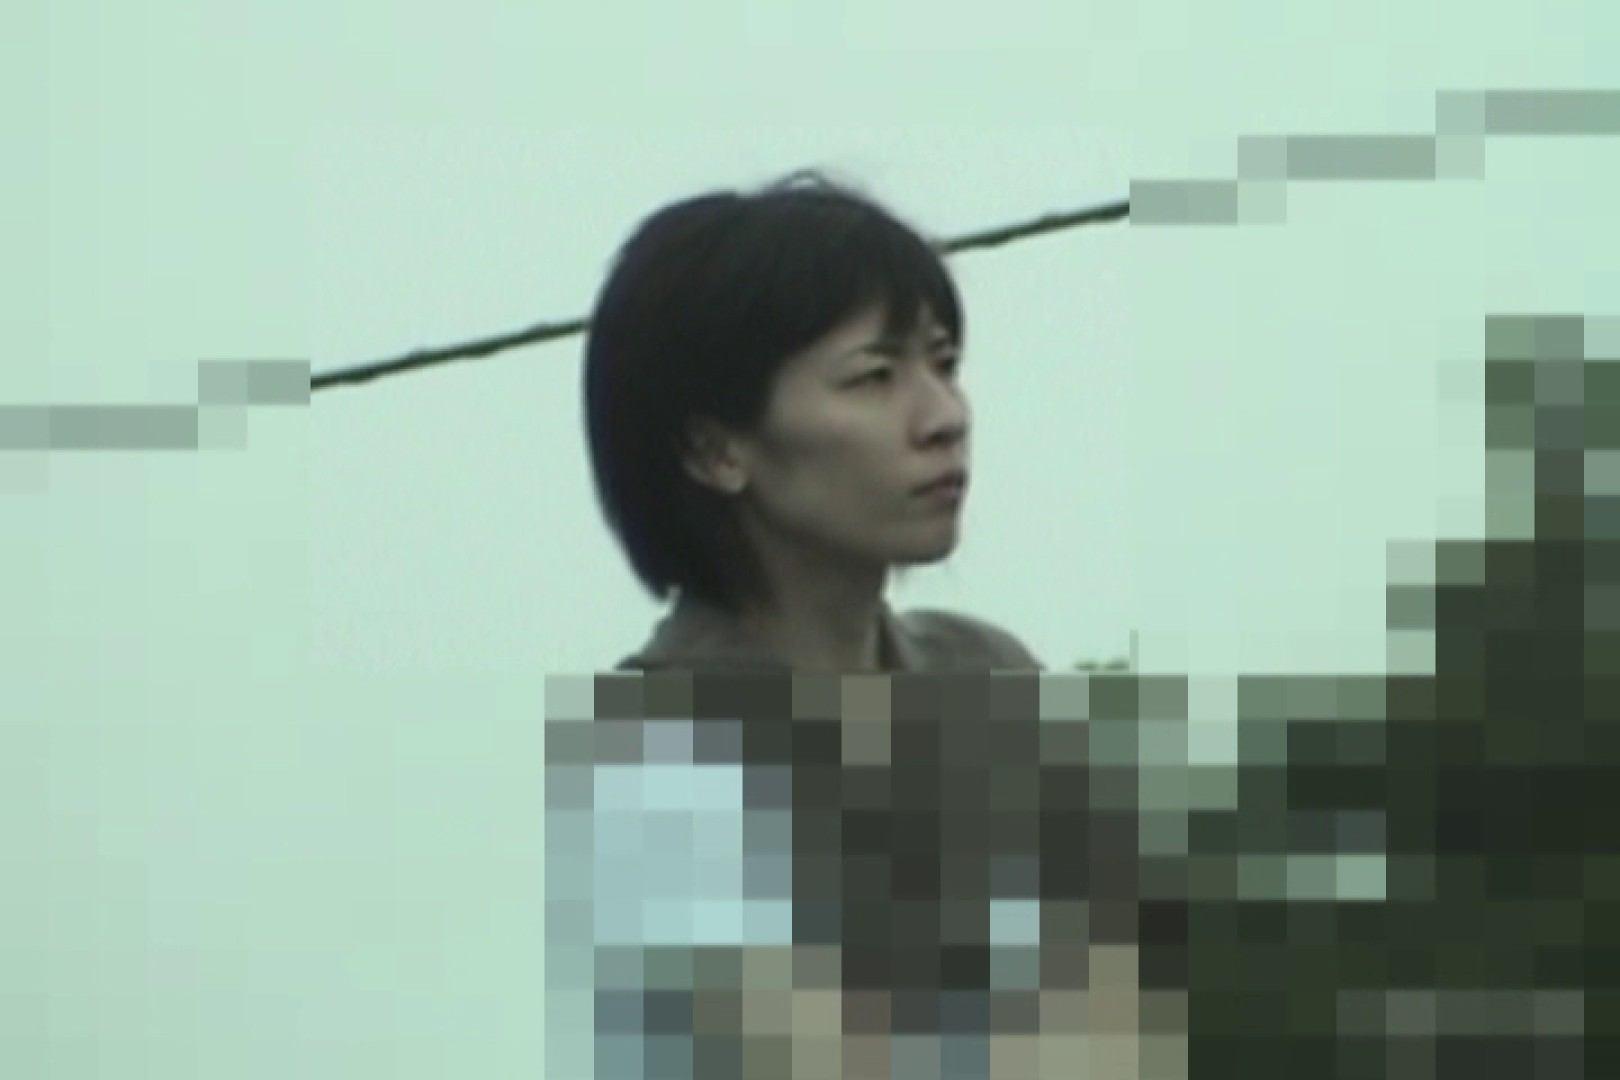 Aquaな露天風呂Vol.793 盗撮映像  72Pix 1